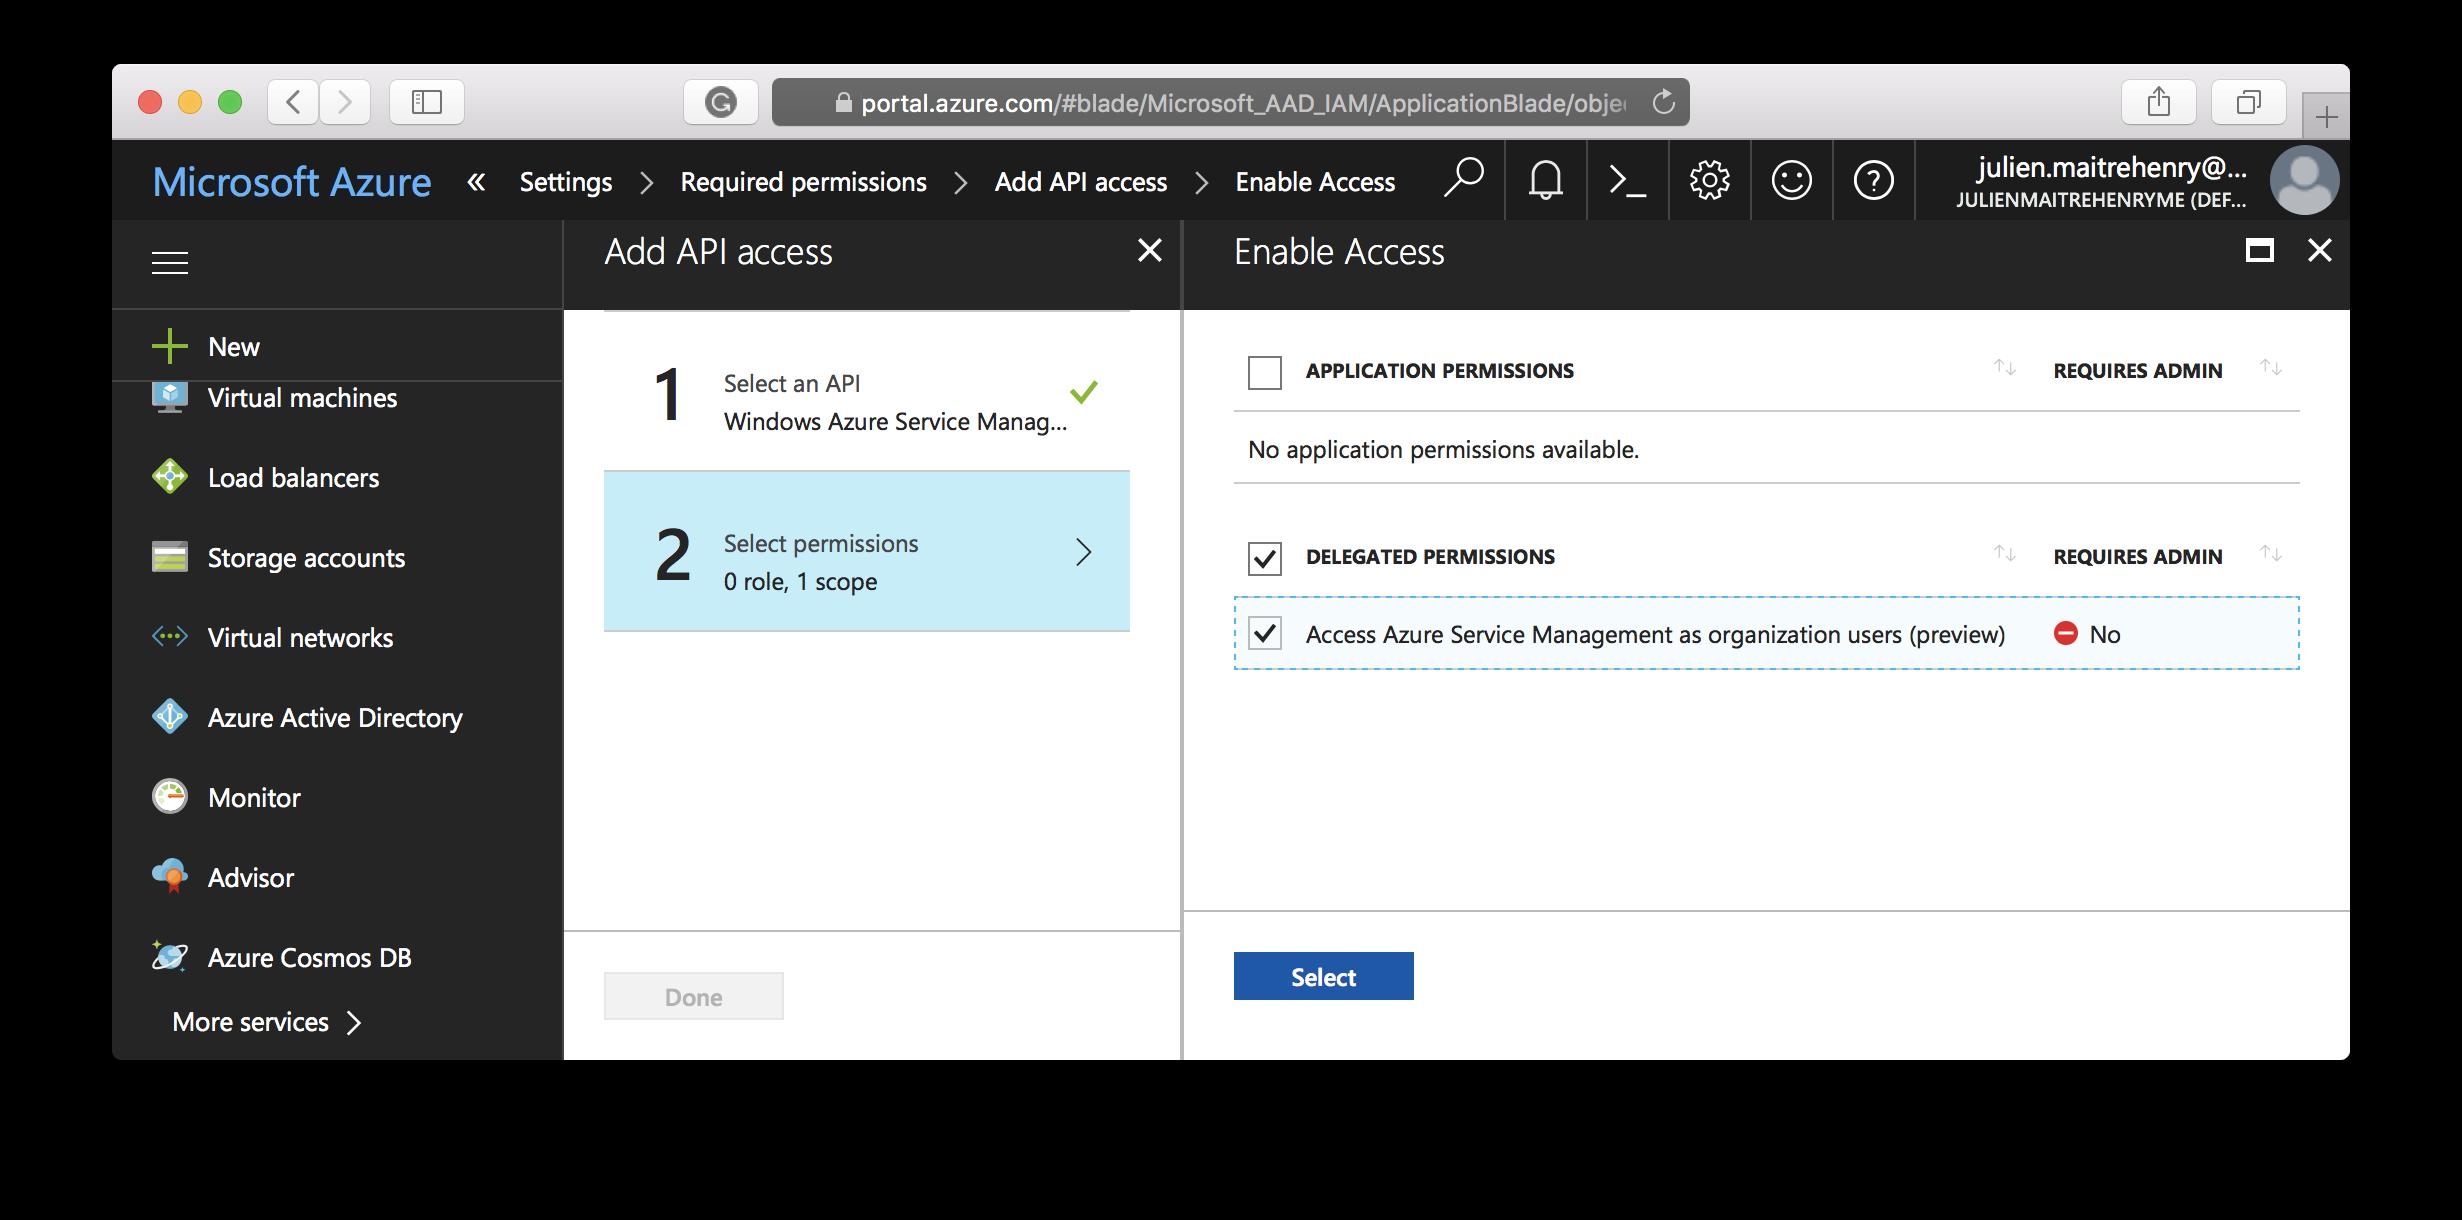 Application - Add access